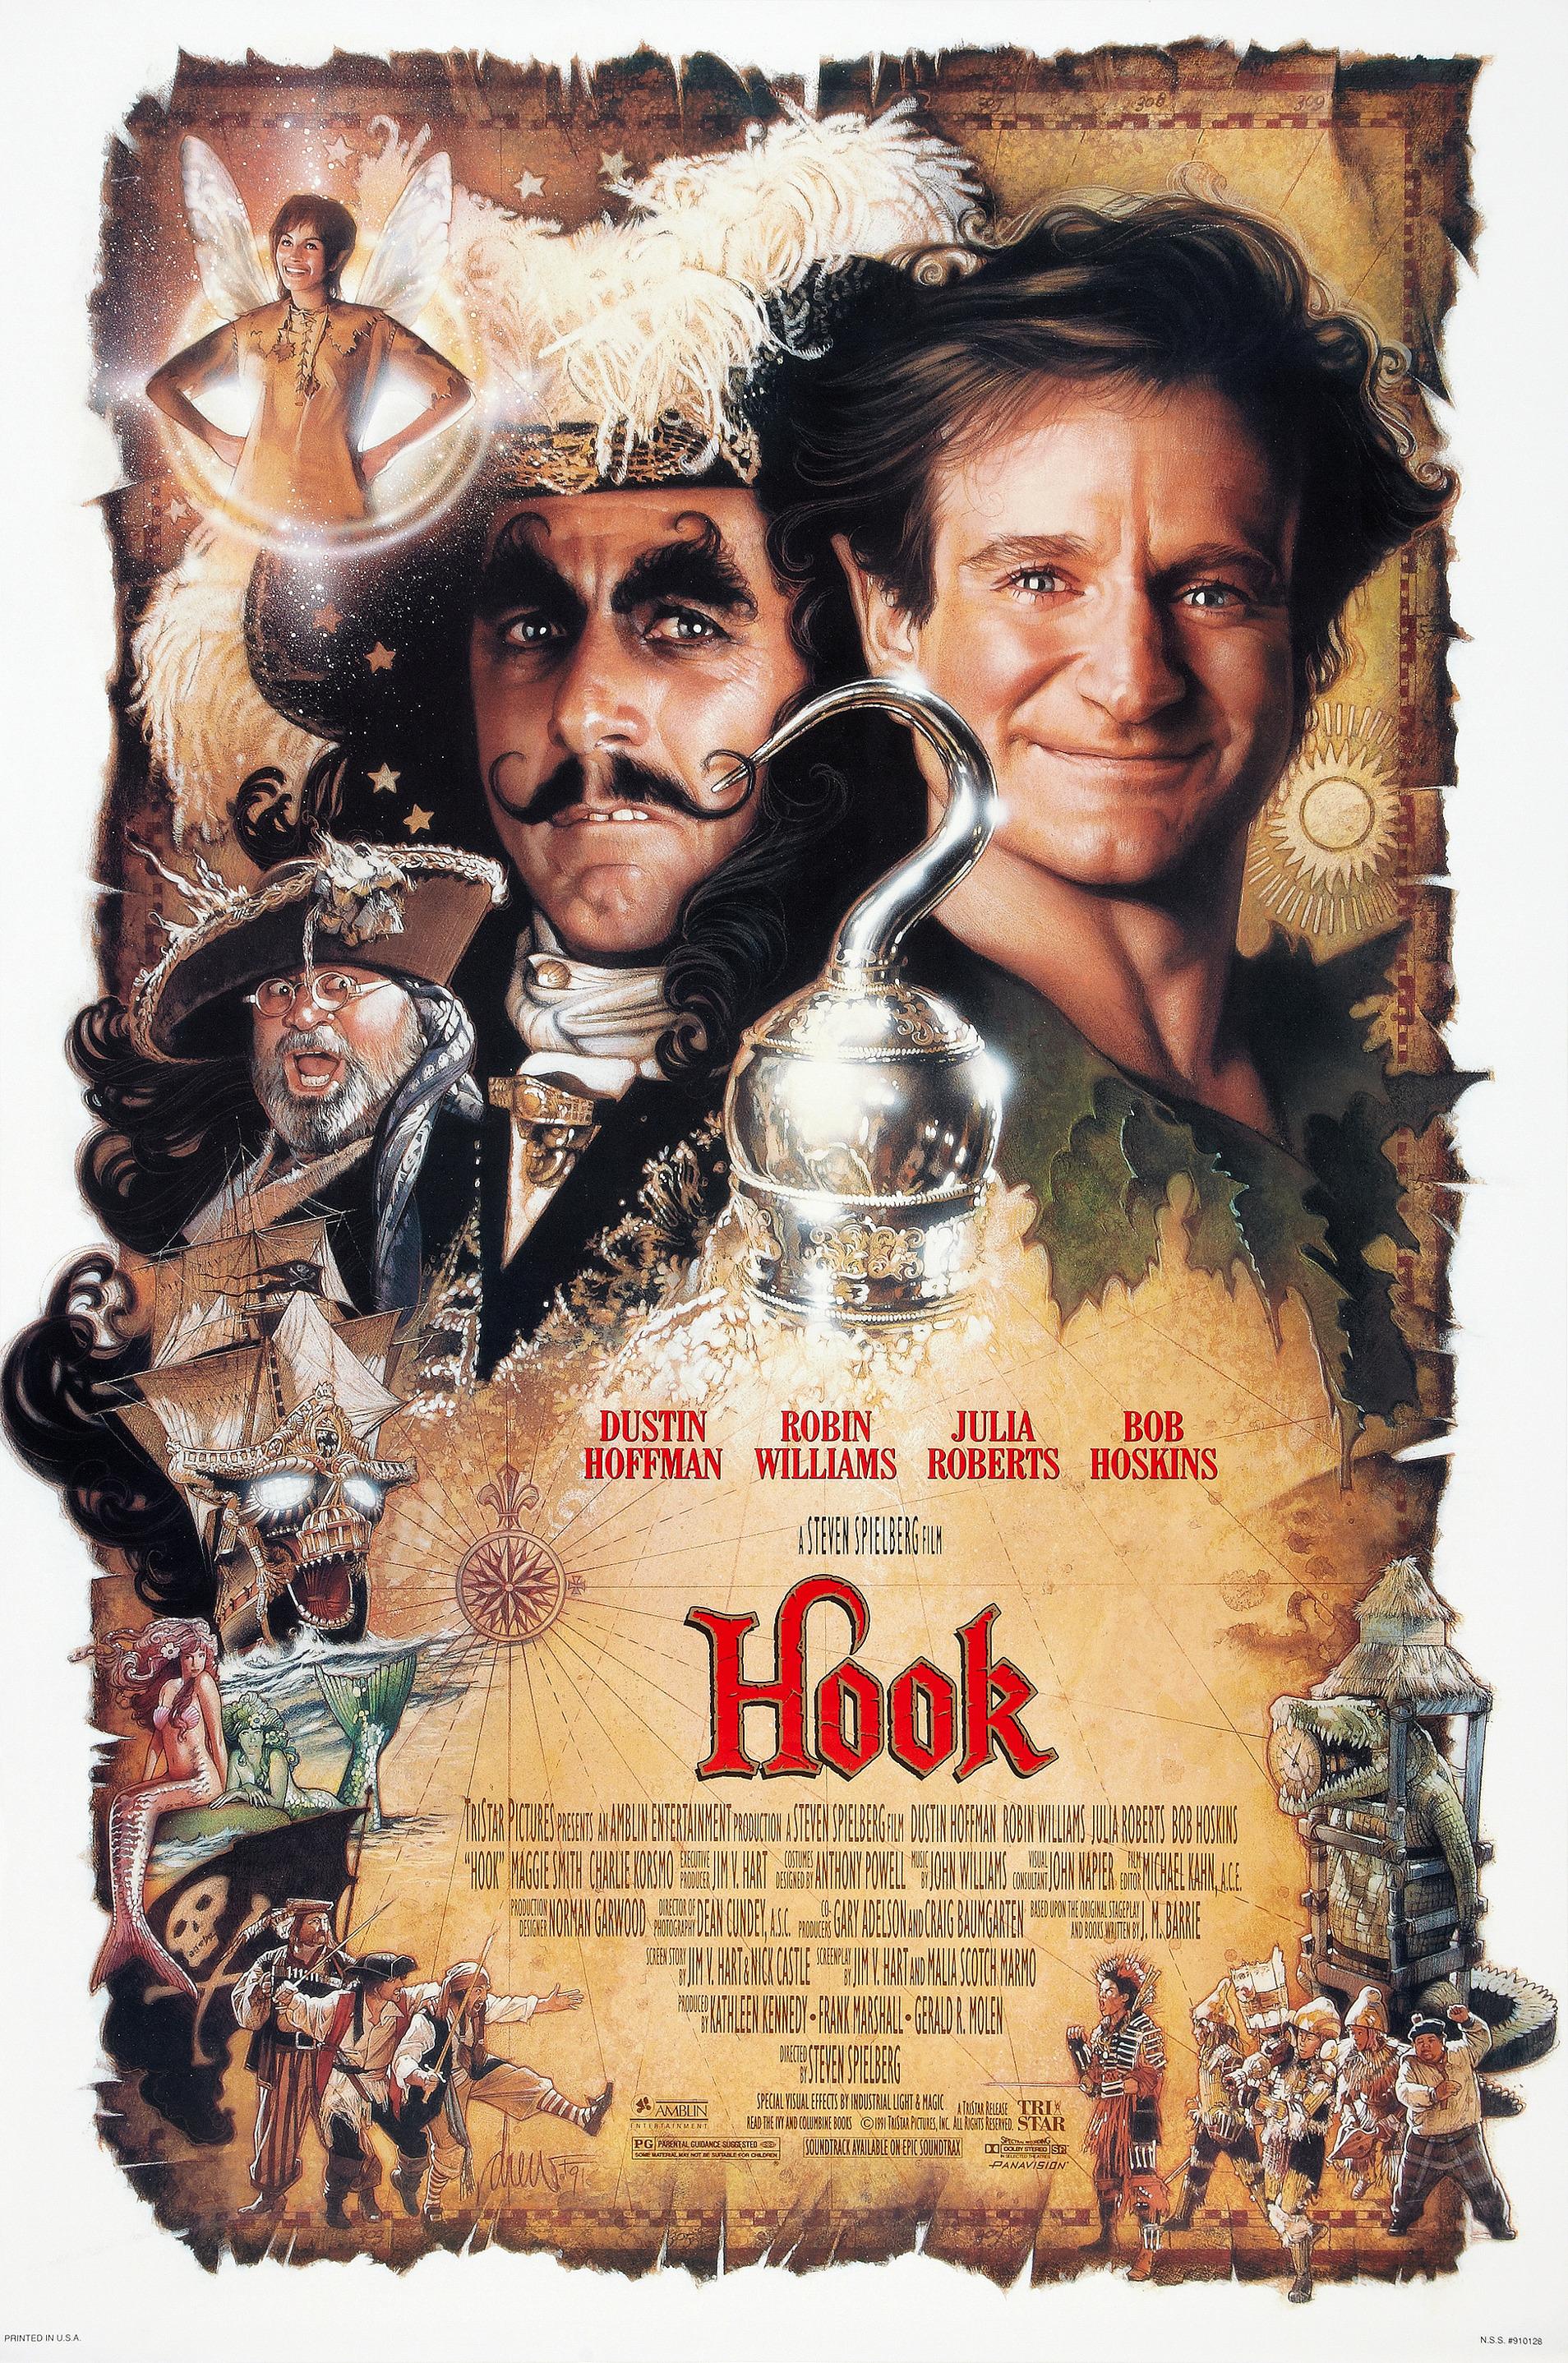 File:Hook poster.jpg